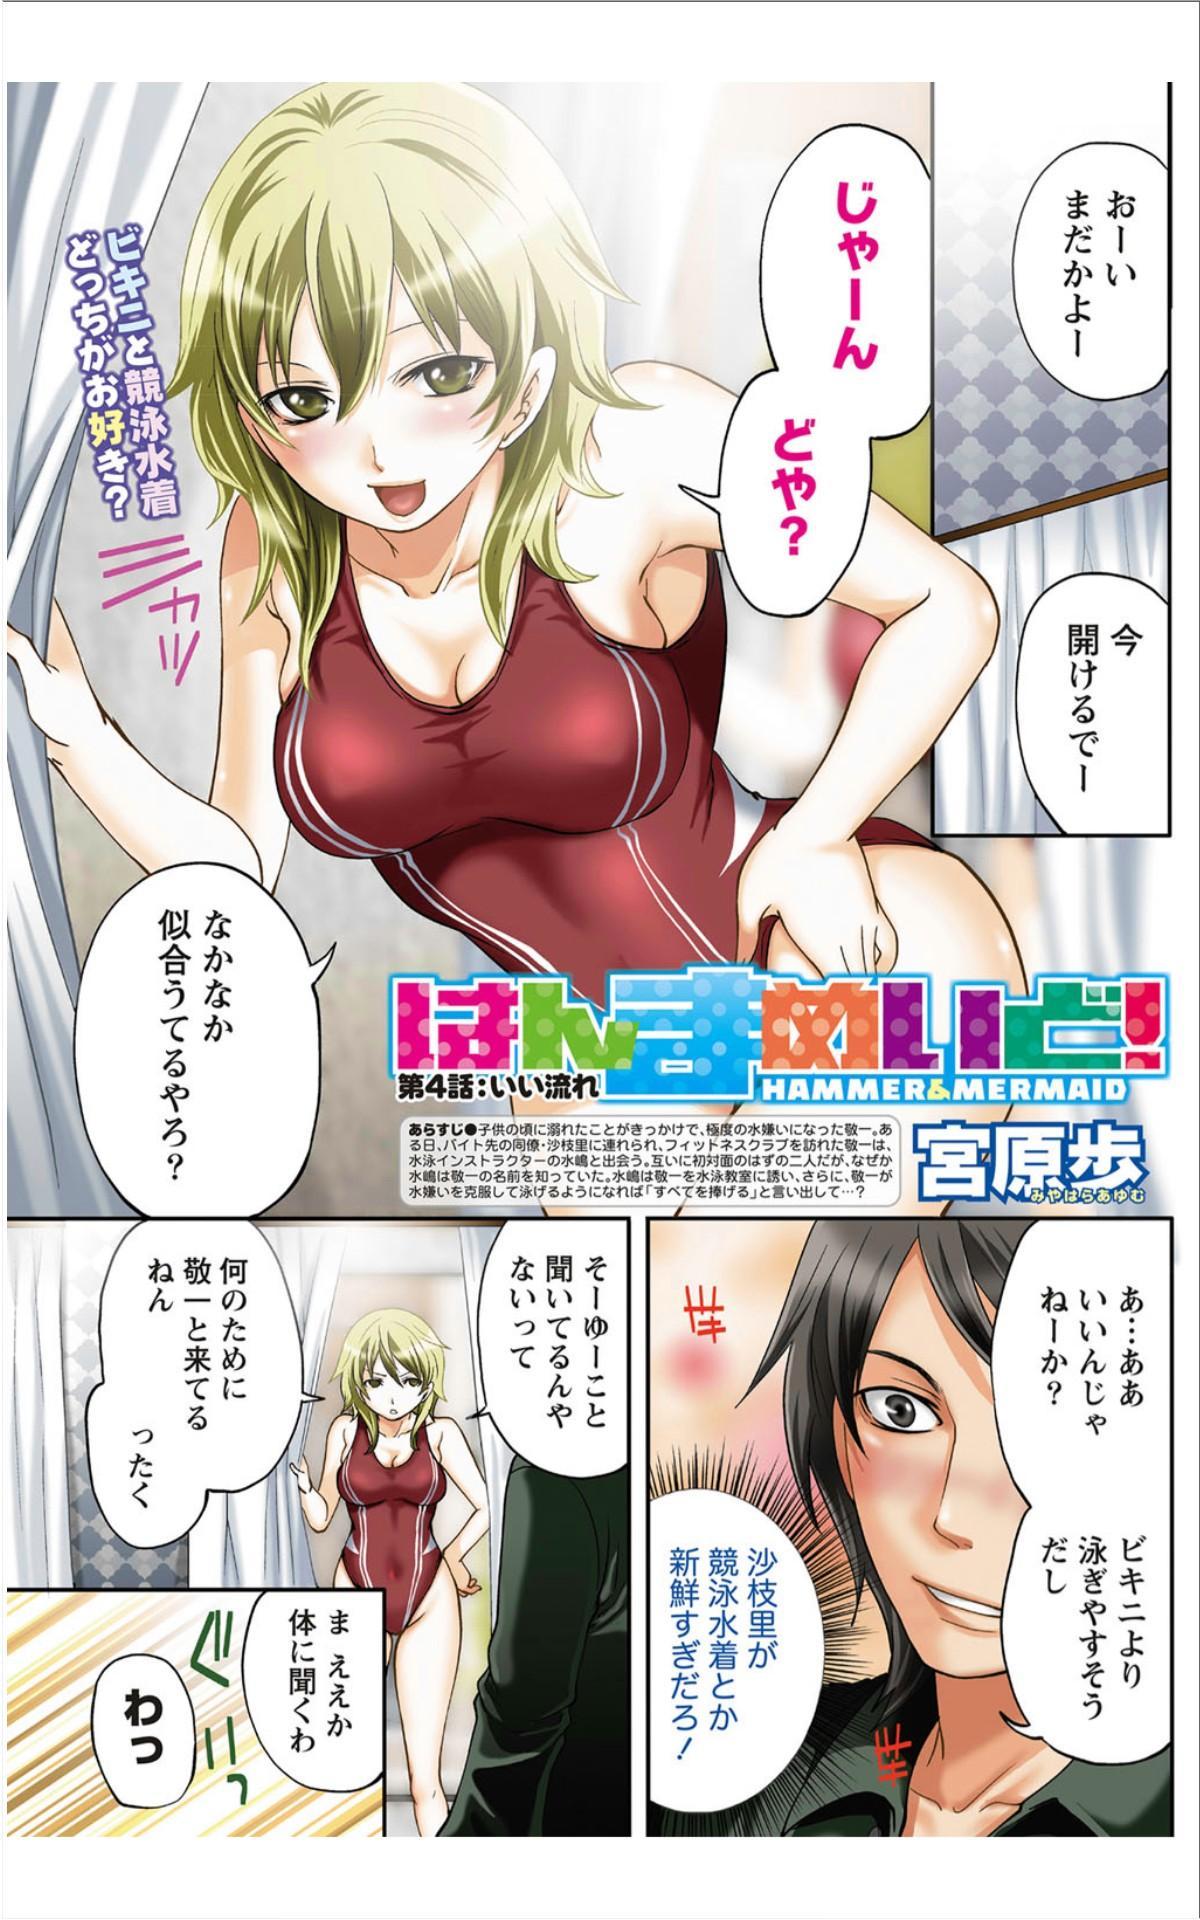 Monthly Vitaman 2012-01 131